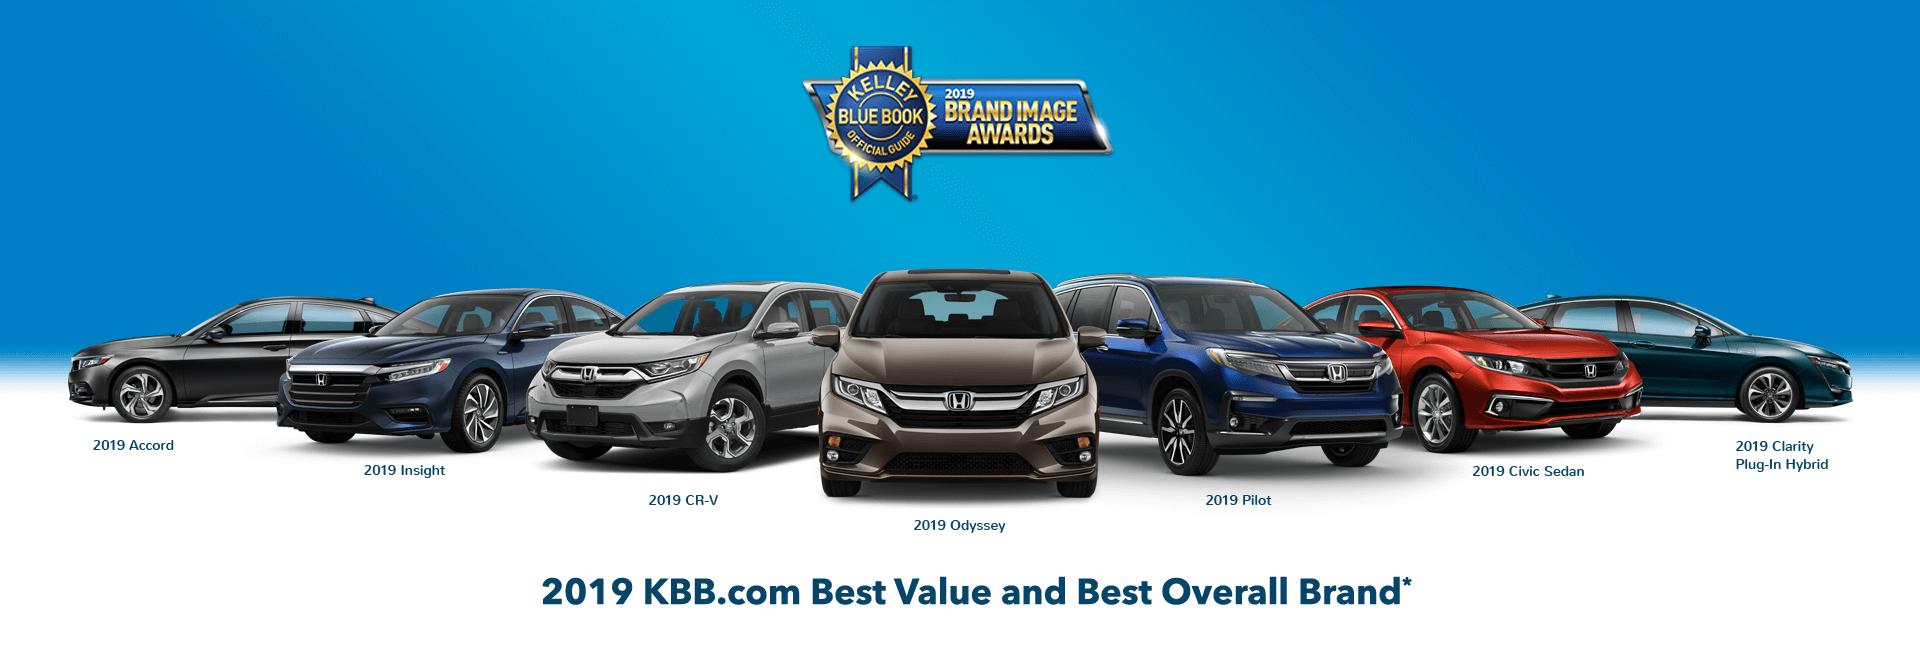 2019 Honda Best Value